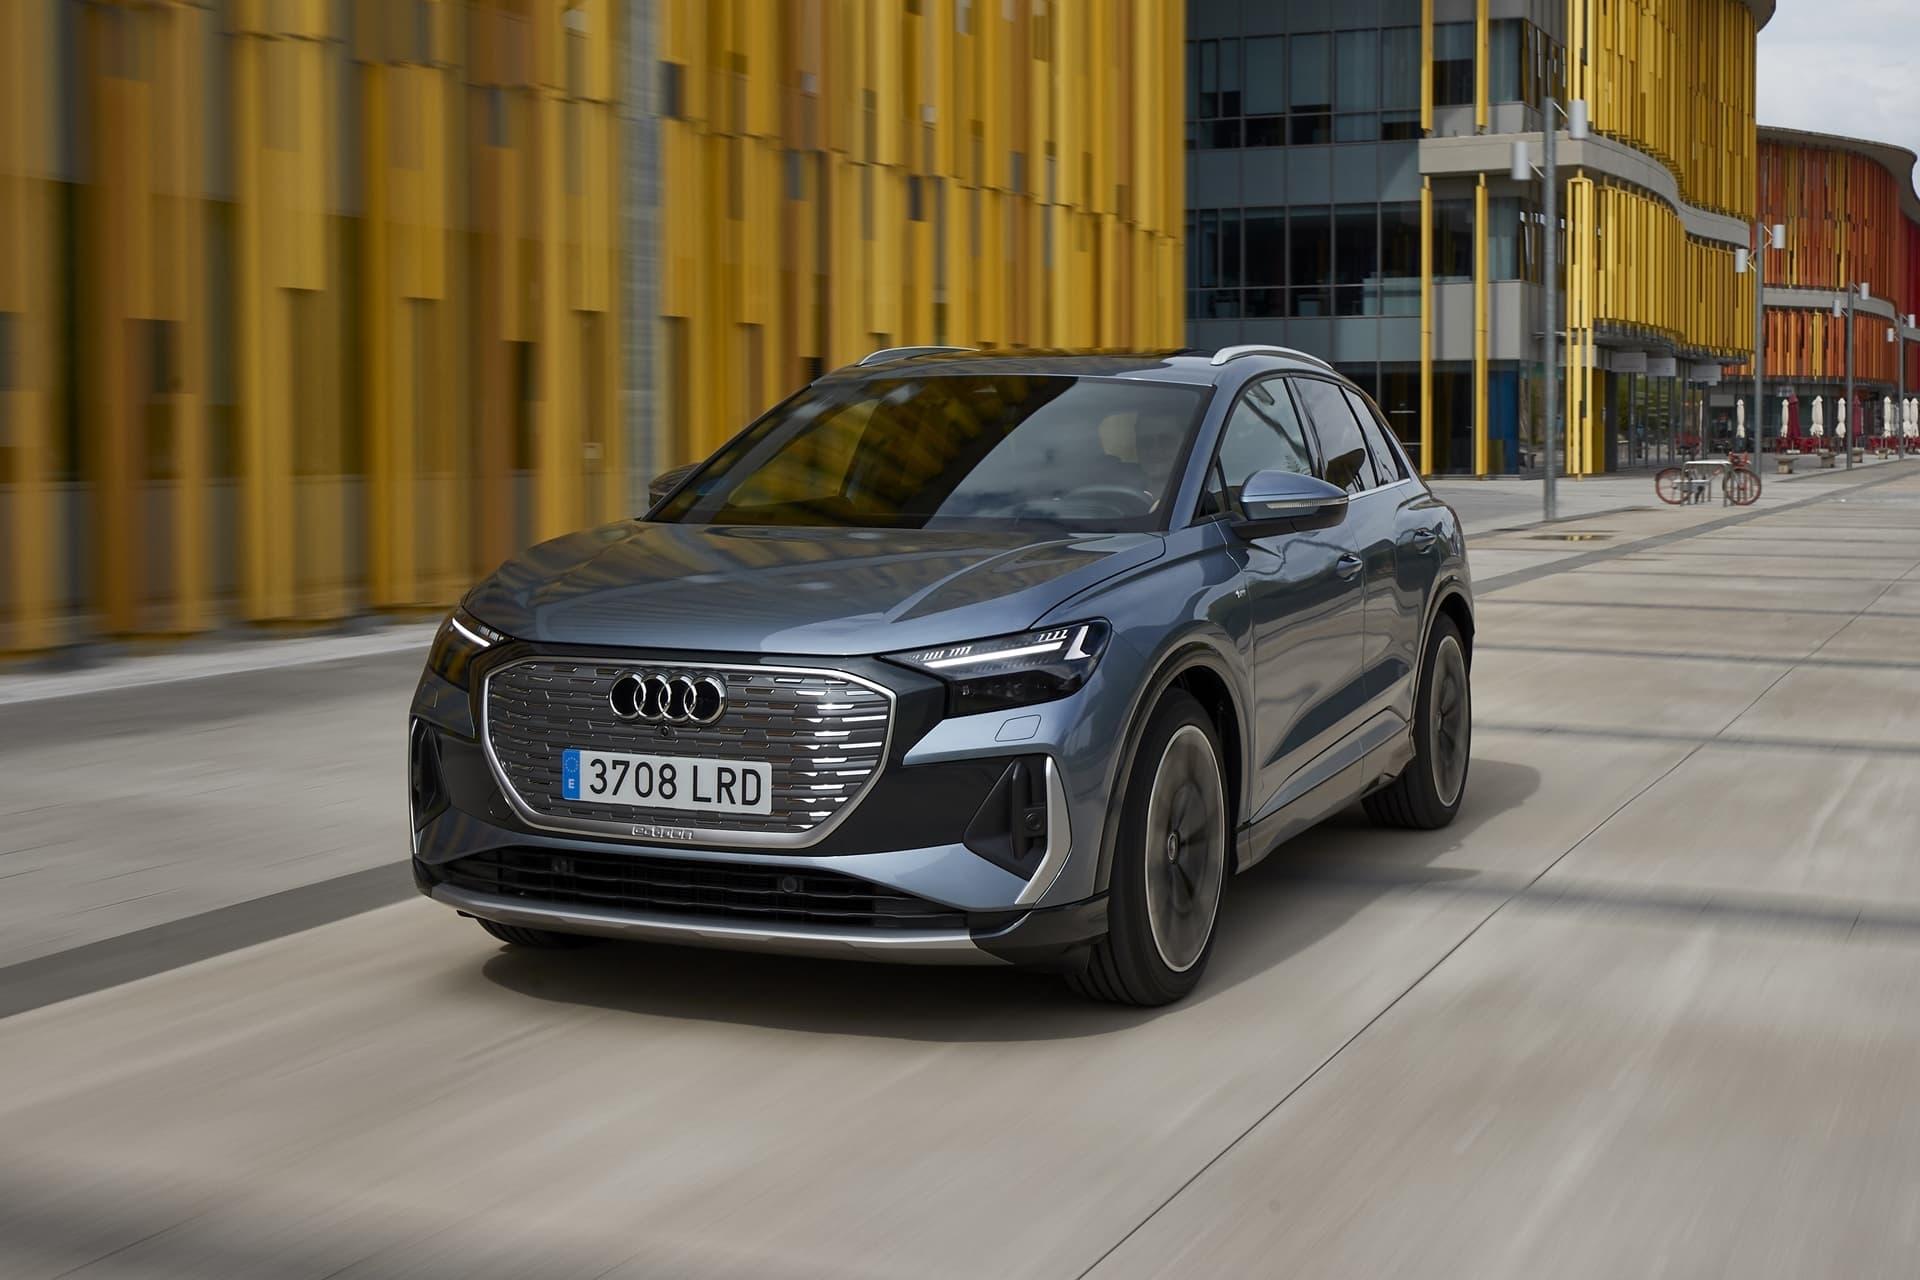 Audi Q4 E Tron 2021 0721 020